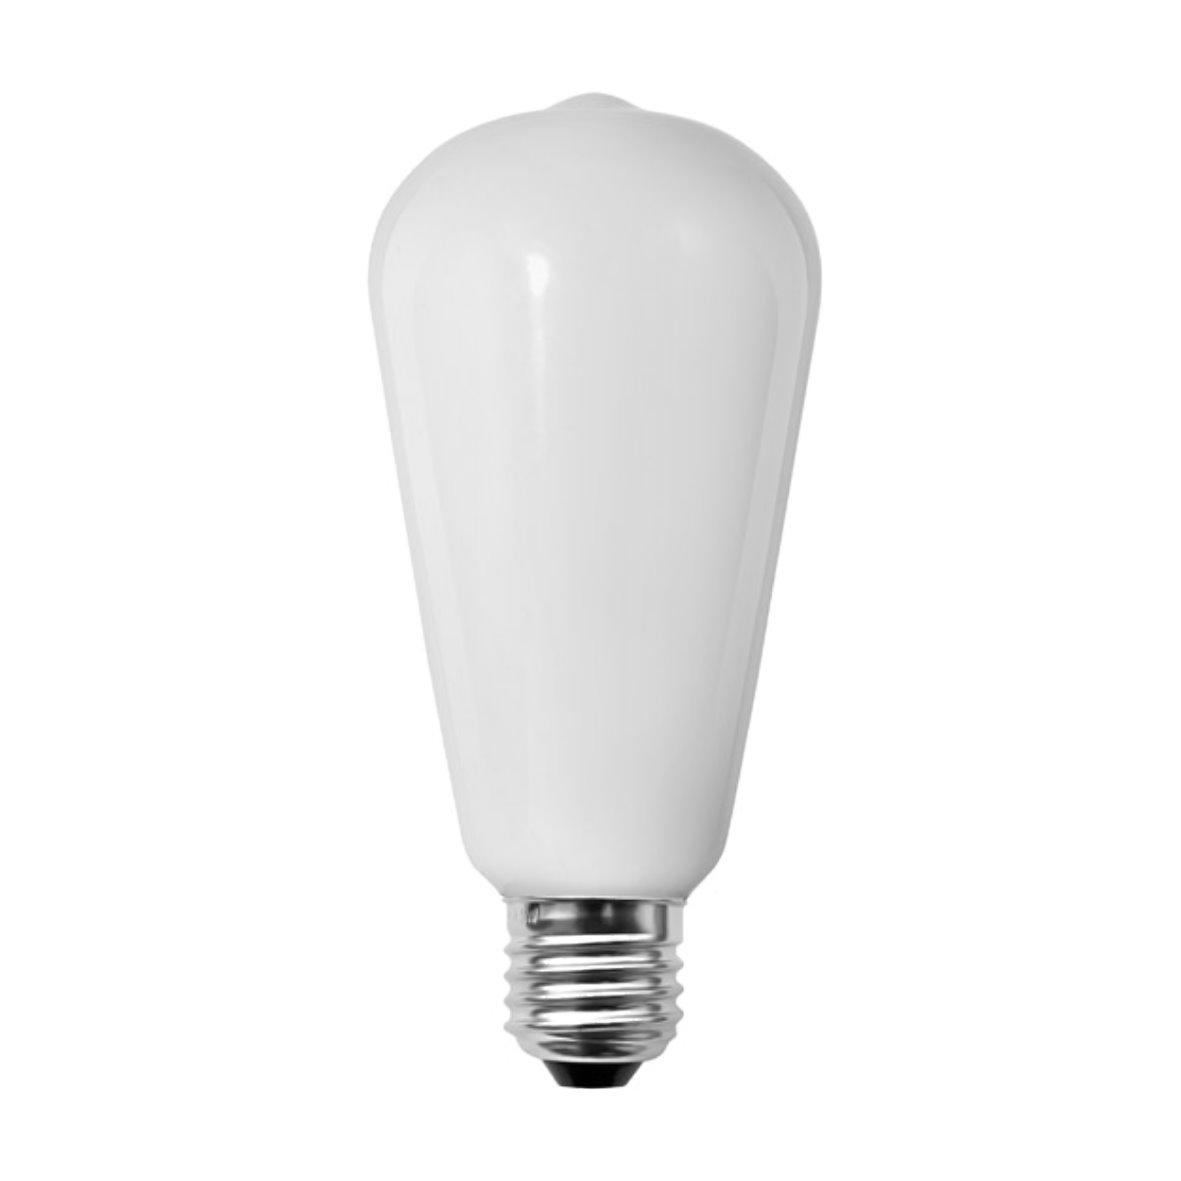 Segula smd LED tête rond e14 e27 ampoules Dimmable variateur Lampe